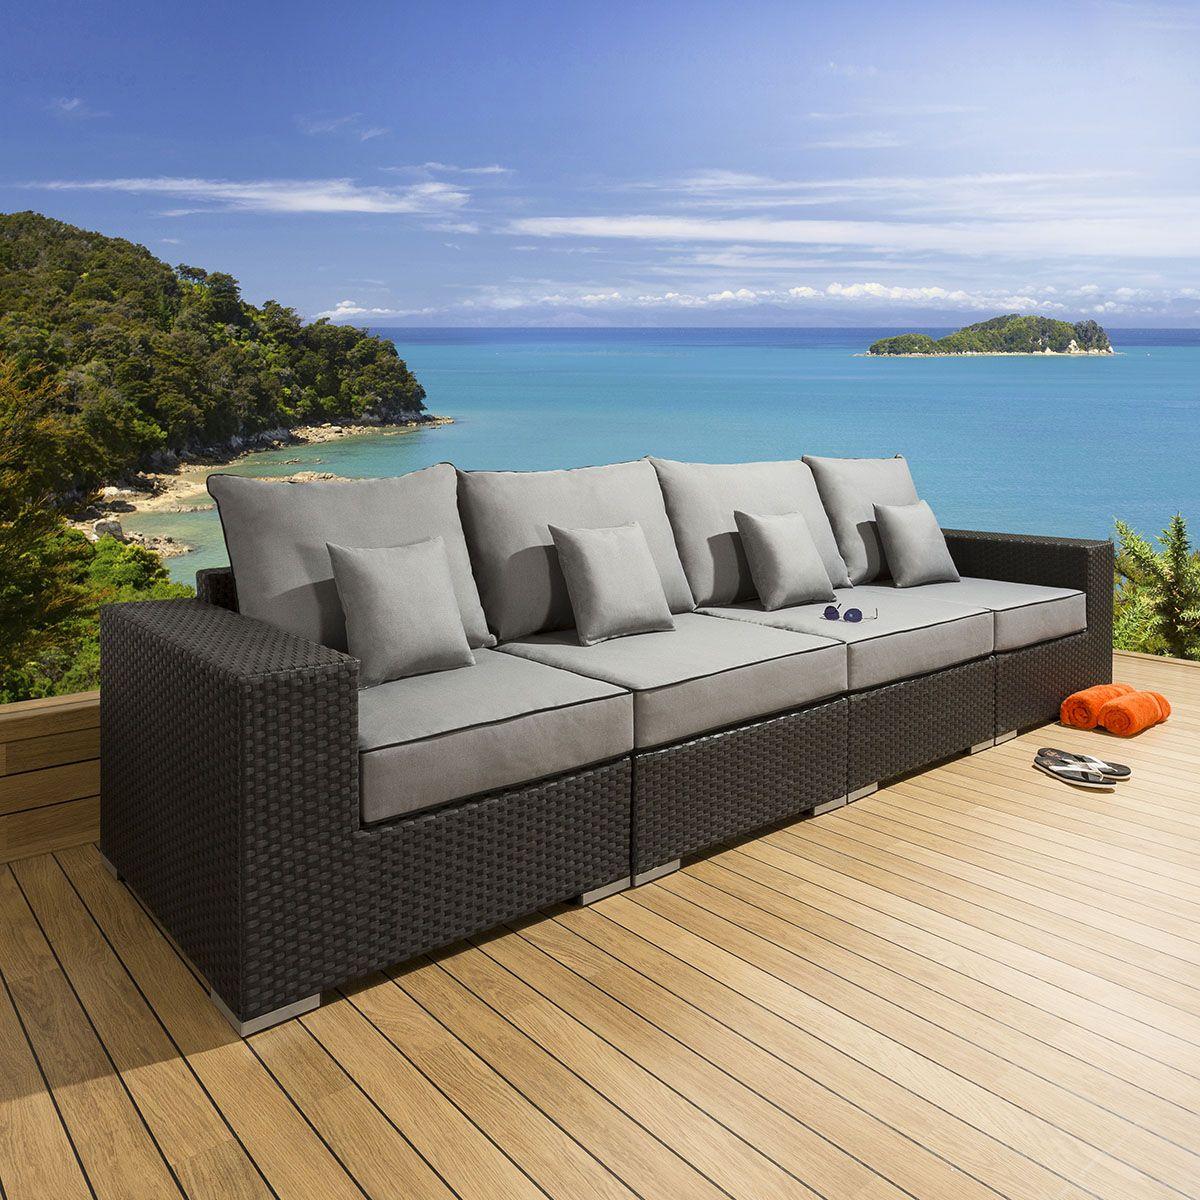 Quatropi Large Outdoor Garden 7 Seater Sofa Black Rattan Grey S7